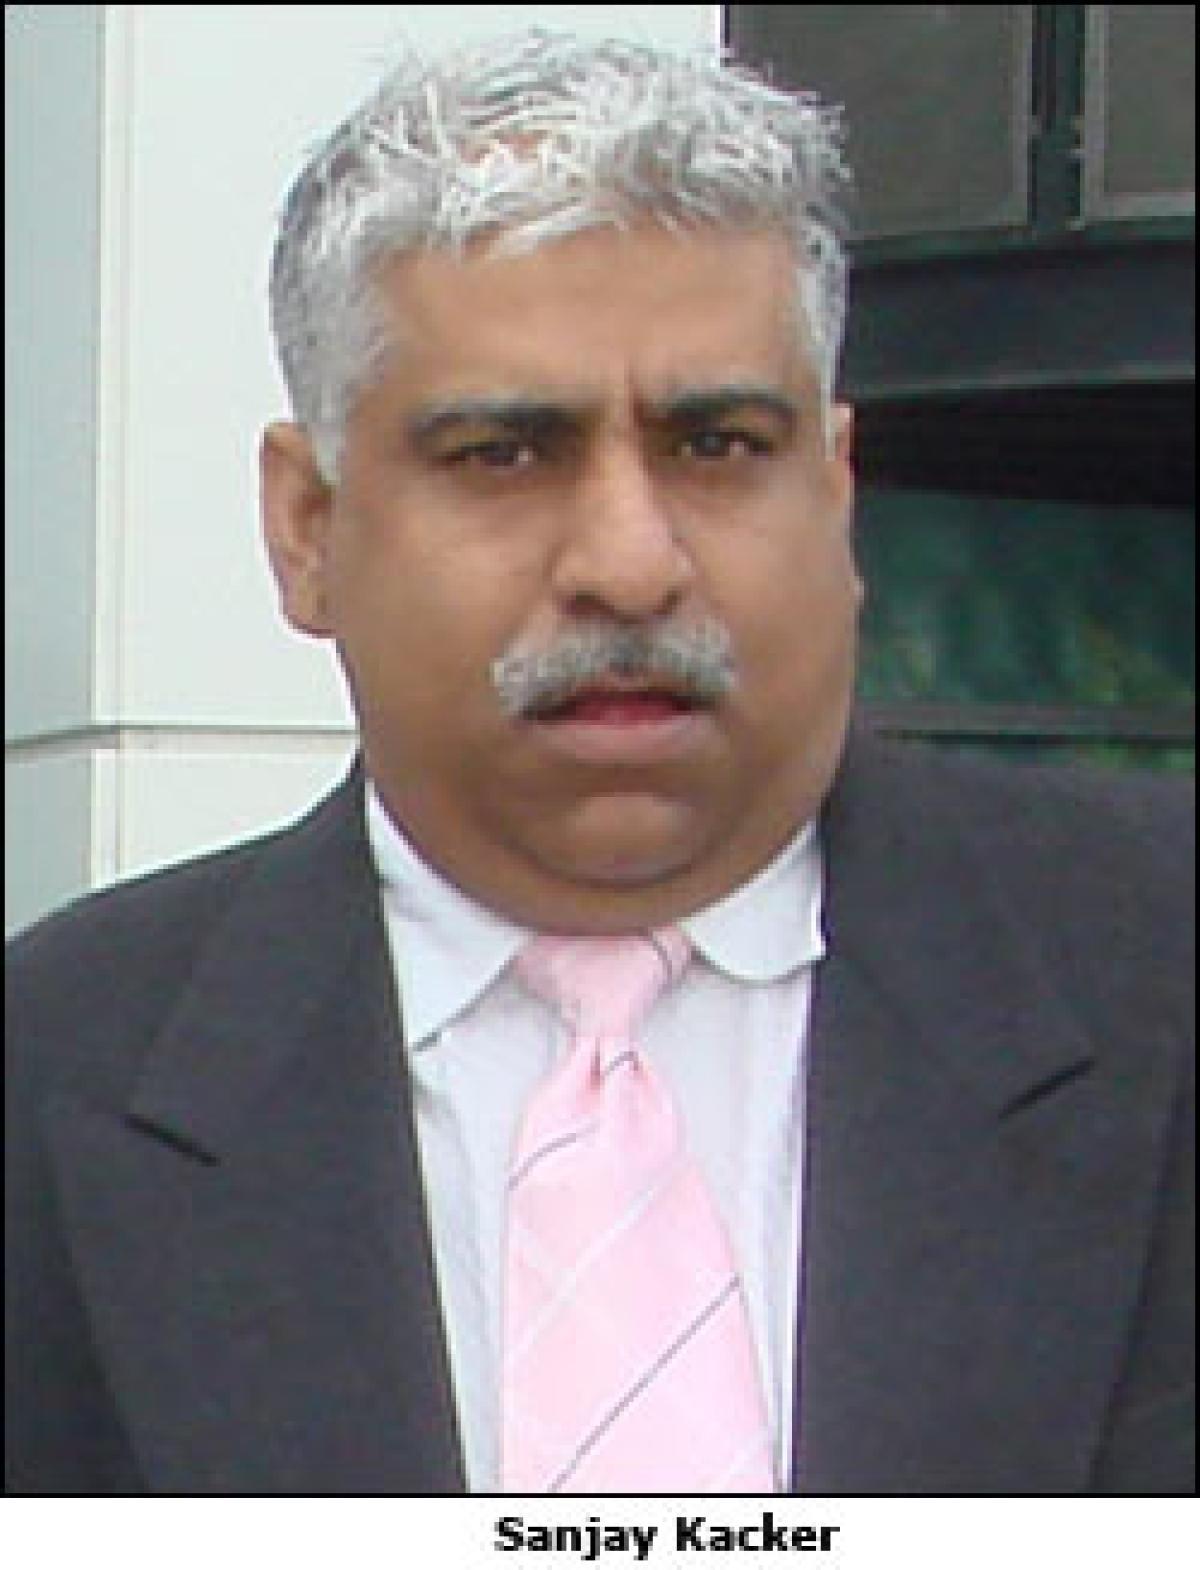 Sanjay Kacker quits DDB Mudra's Celsius as SVP